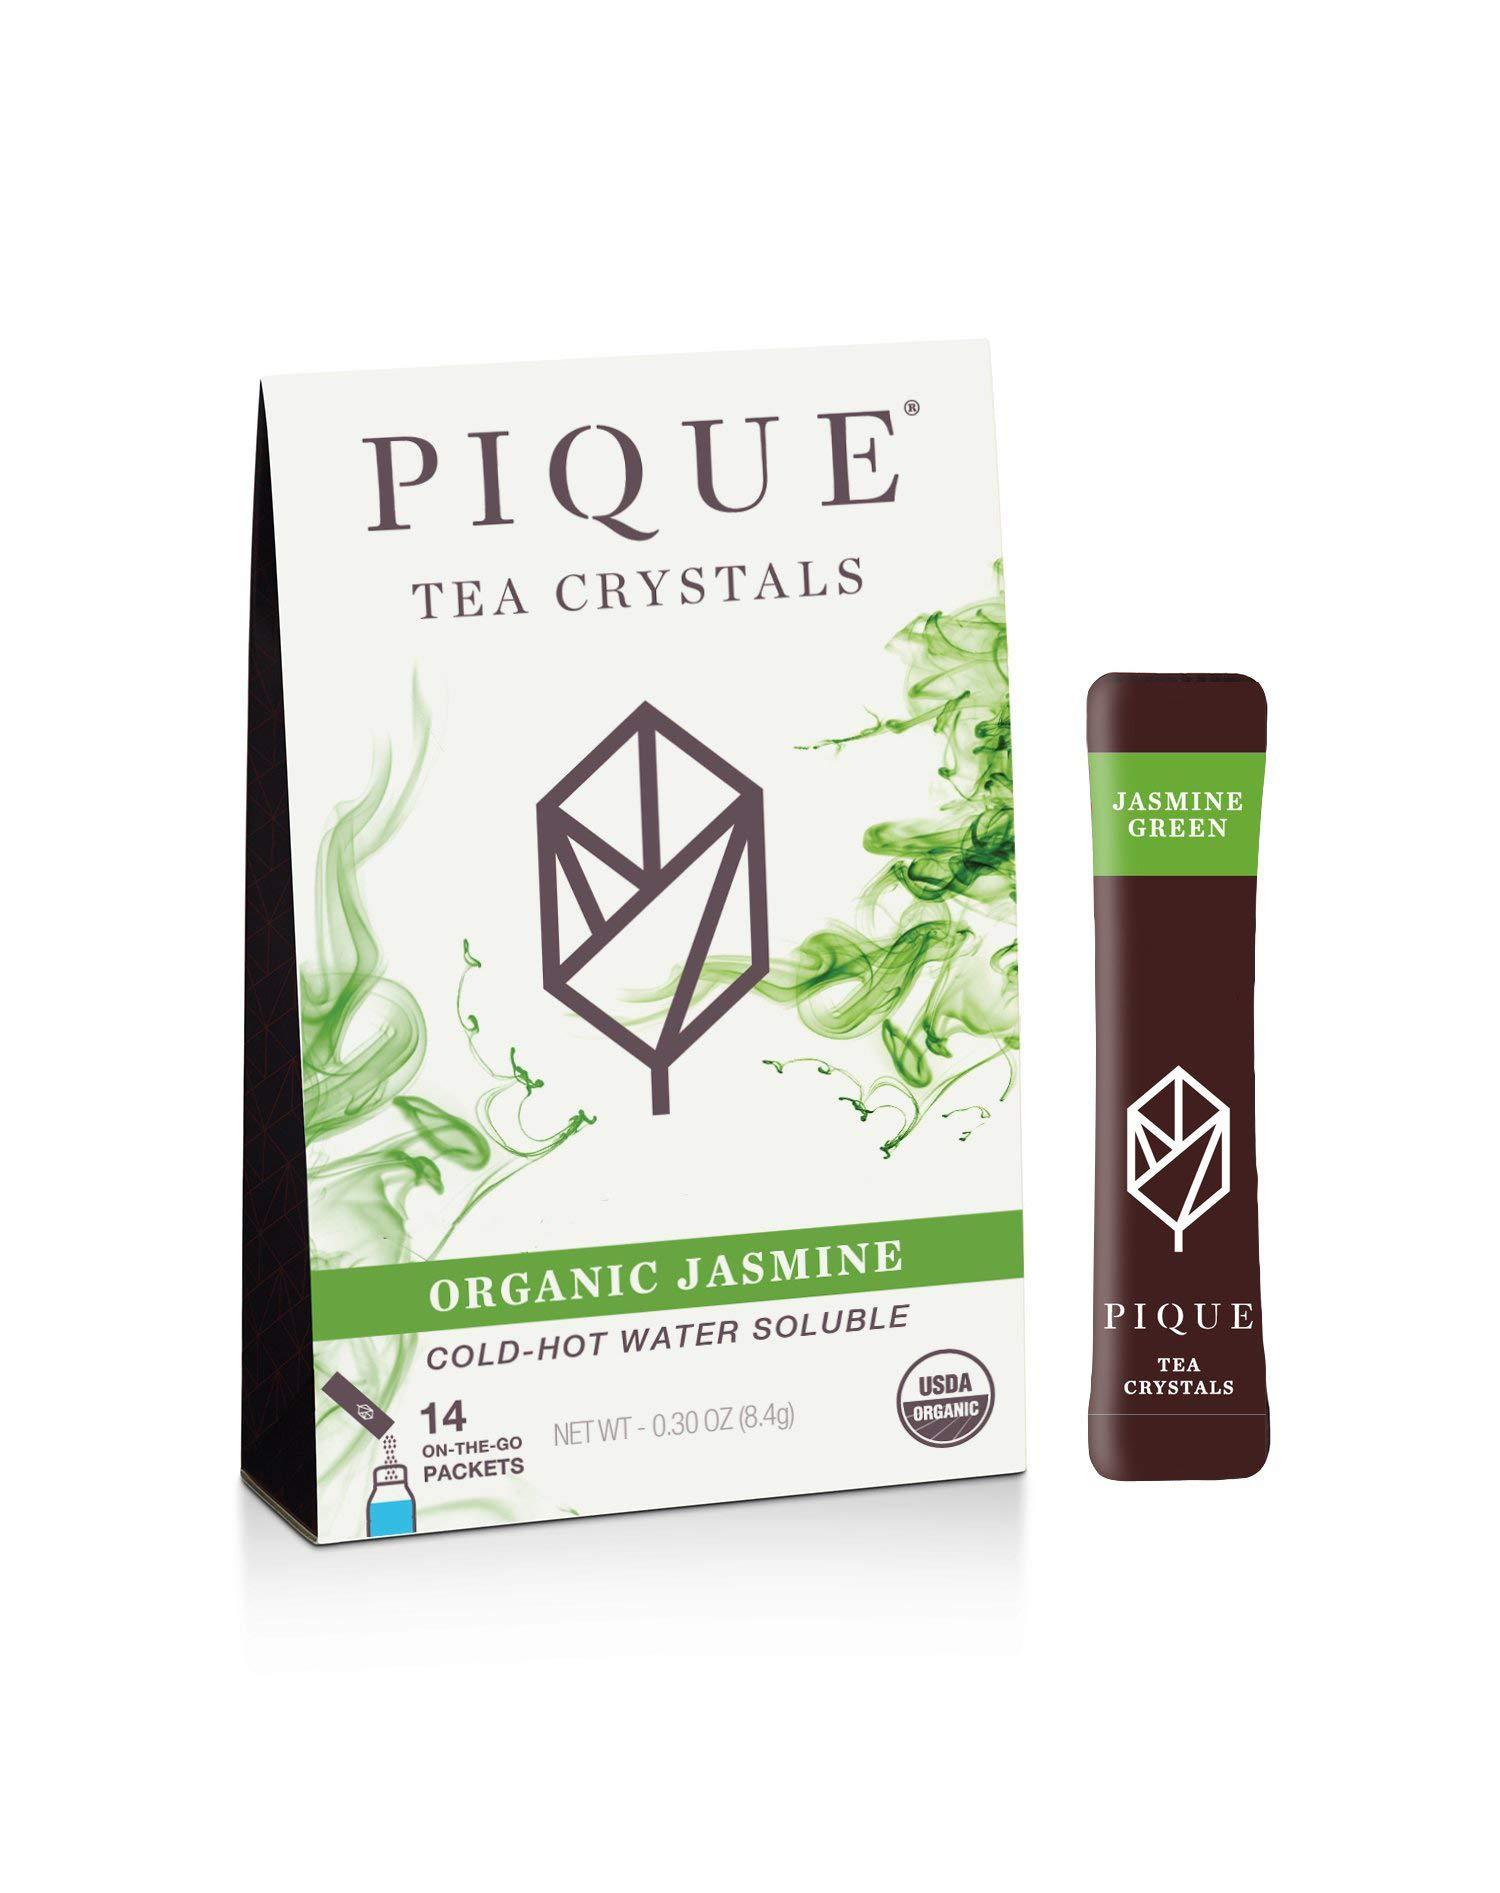 Pique Tea Organic Jasmine Green Tea Crystals - Gut Health, Fasting, Calm -14 Single Serve Sticks (Pack of 1) by PIQUE